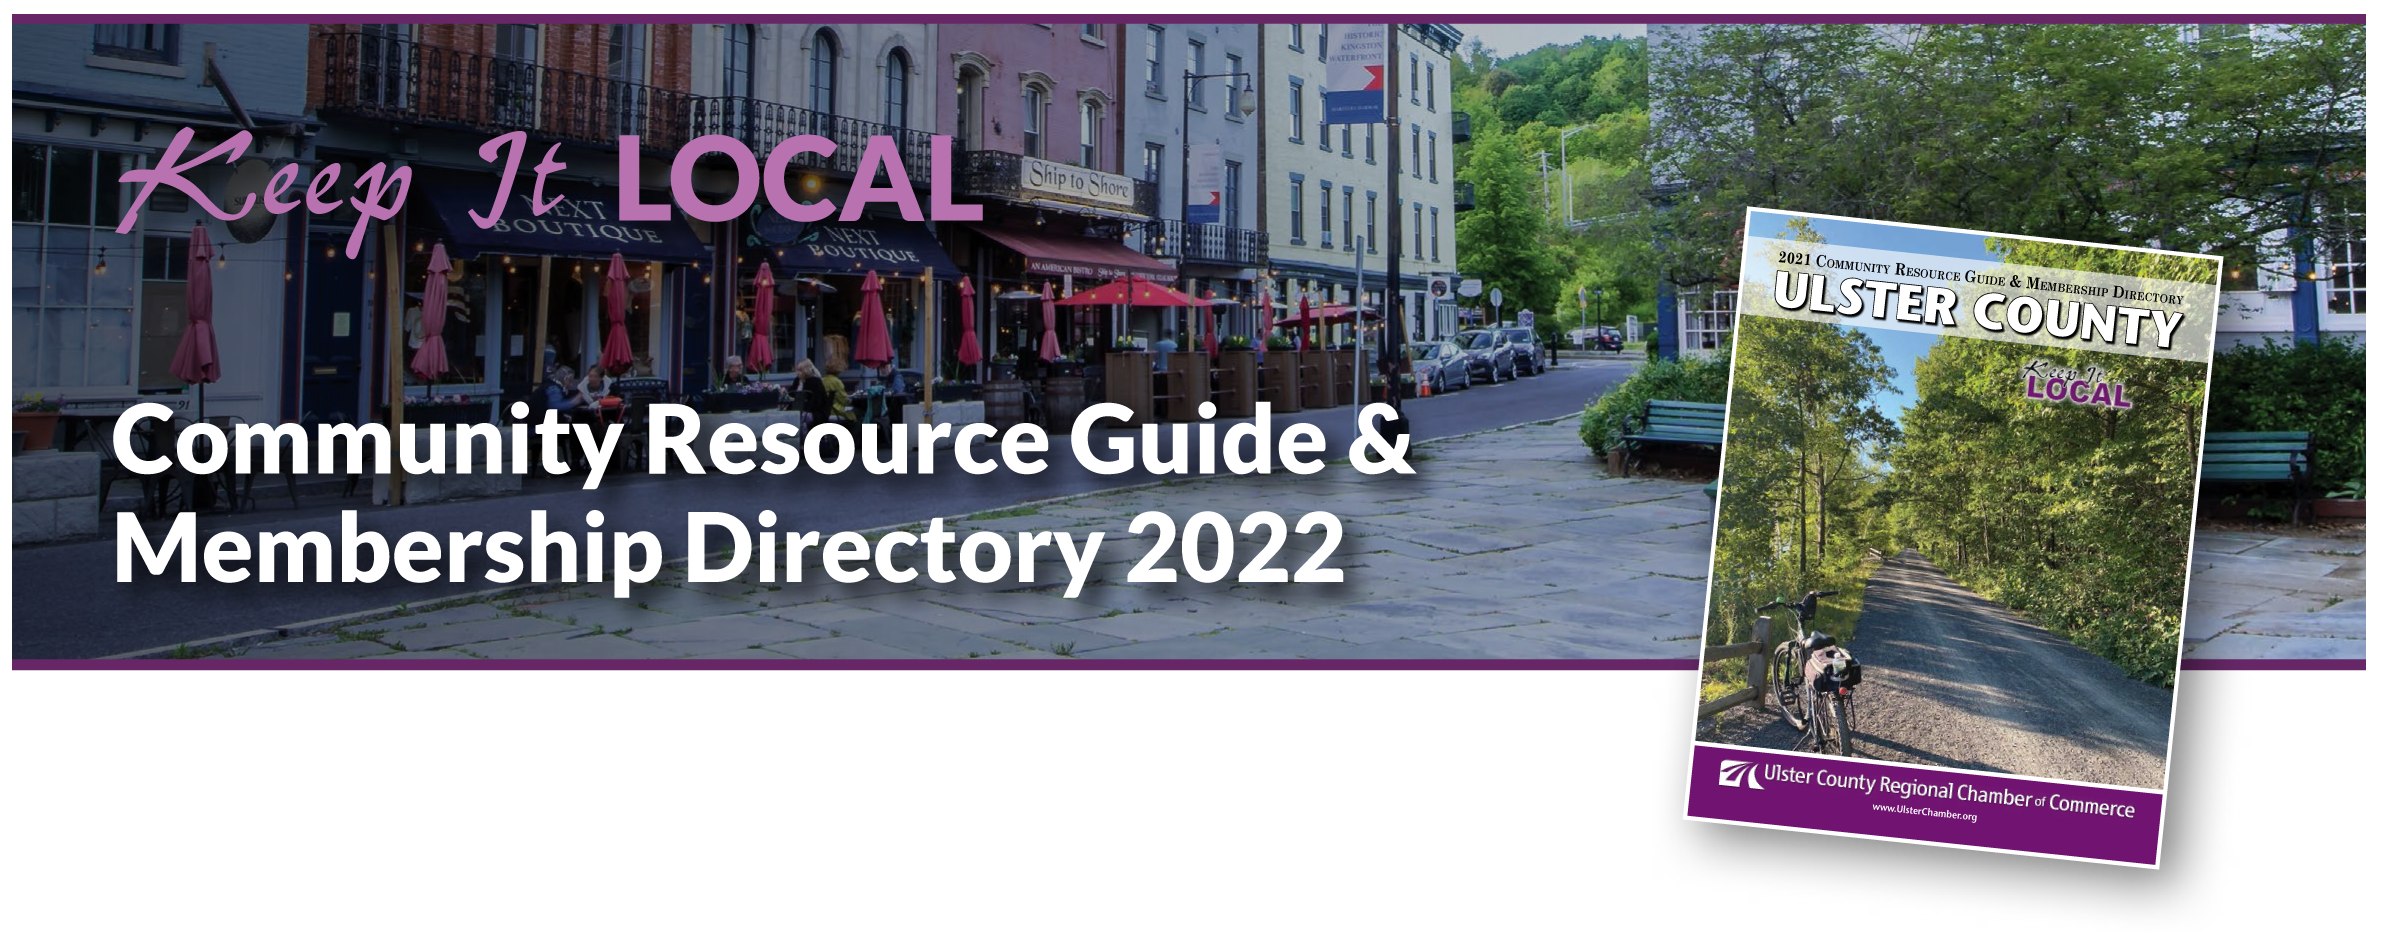 Directory-Media-Kit-Graphic